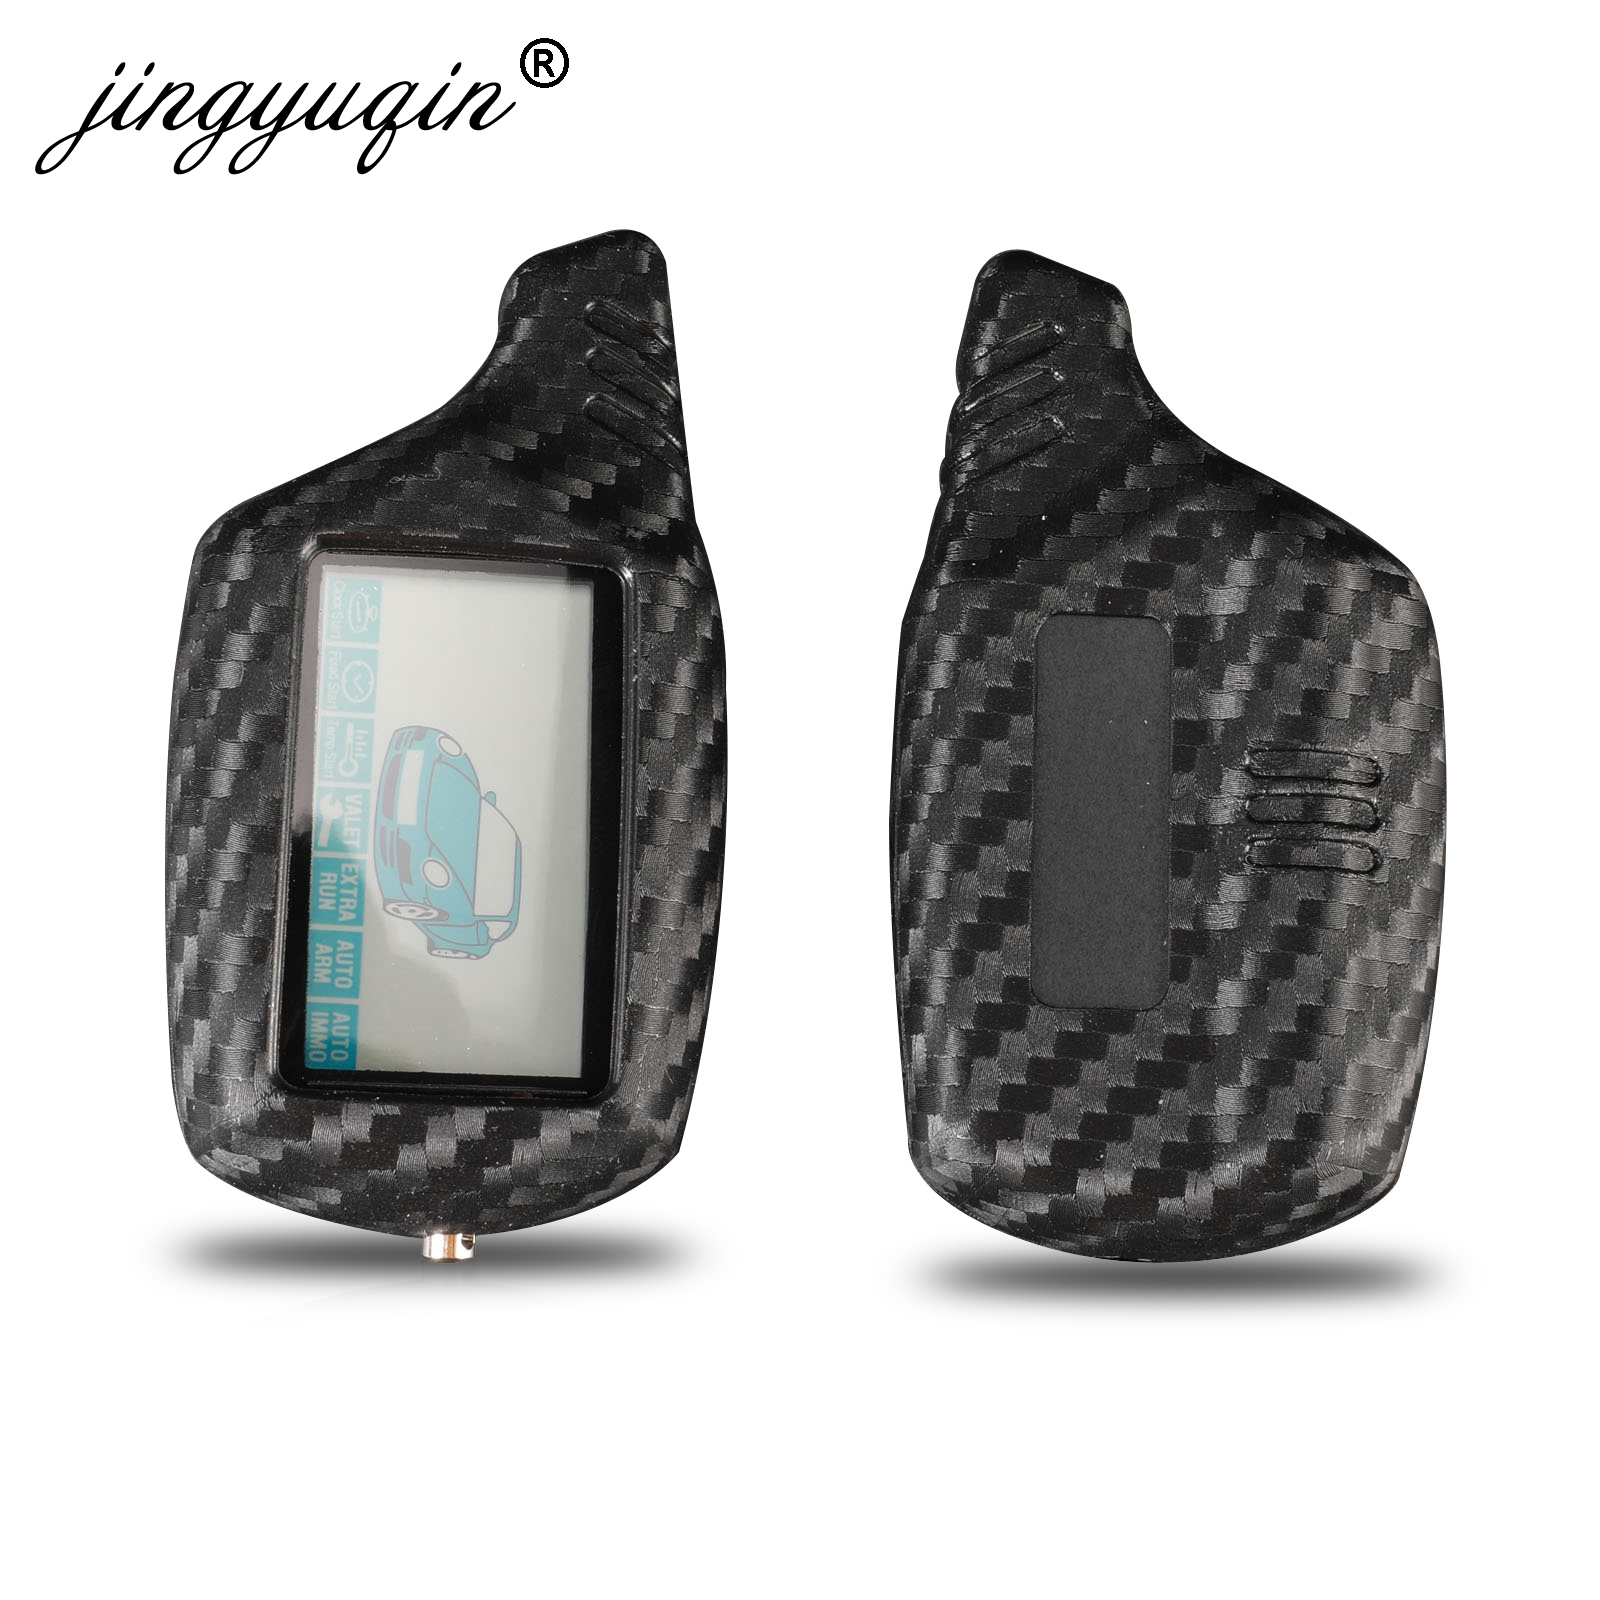 Jingyuqin B9 LCD Alarm Carbon Silicone Key Cover Case For Starline B91 B6 B61 A91 A61 C9 V7 Jaguar Remote 2 Way Alarm Keychain